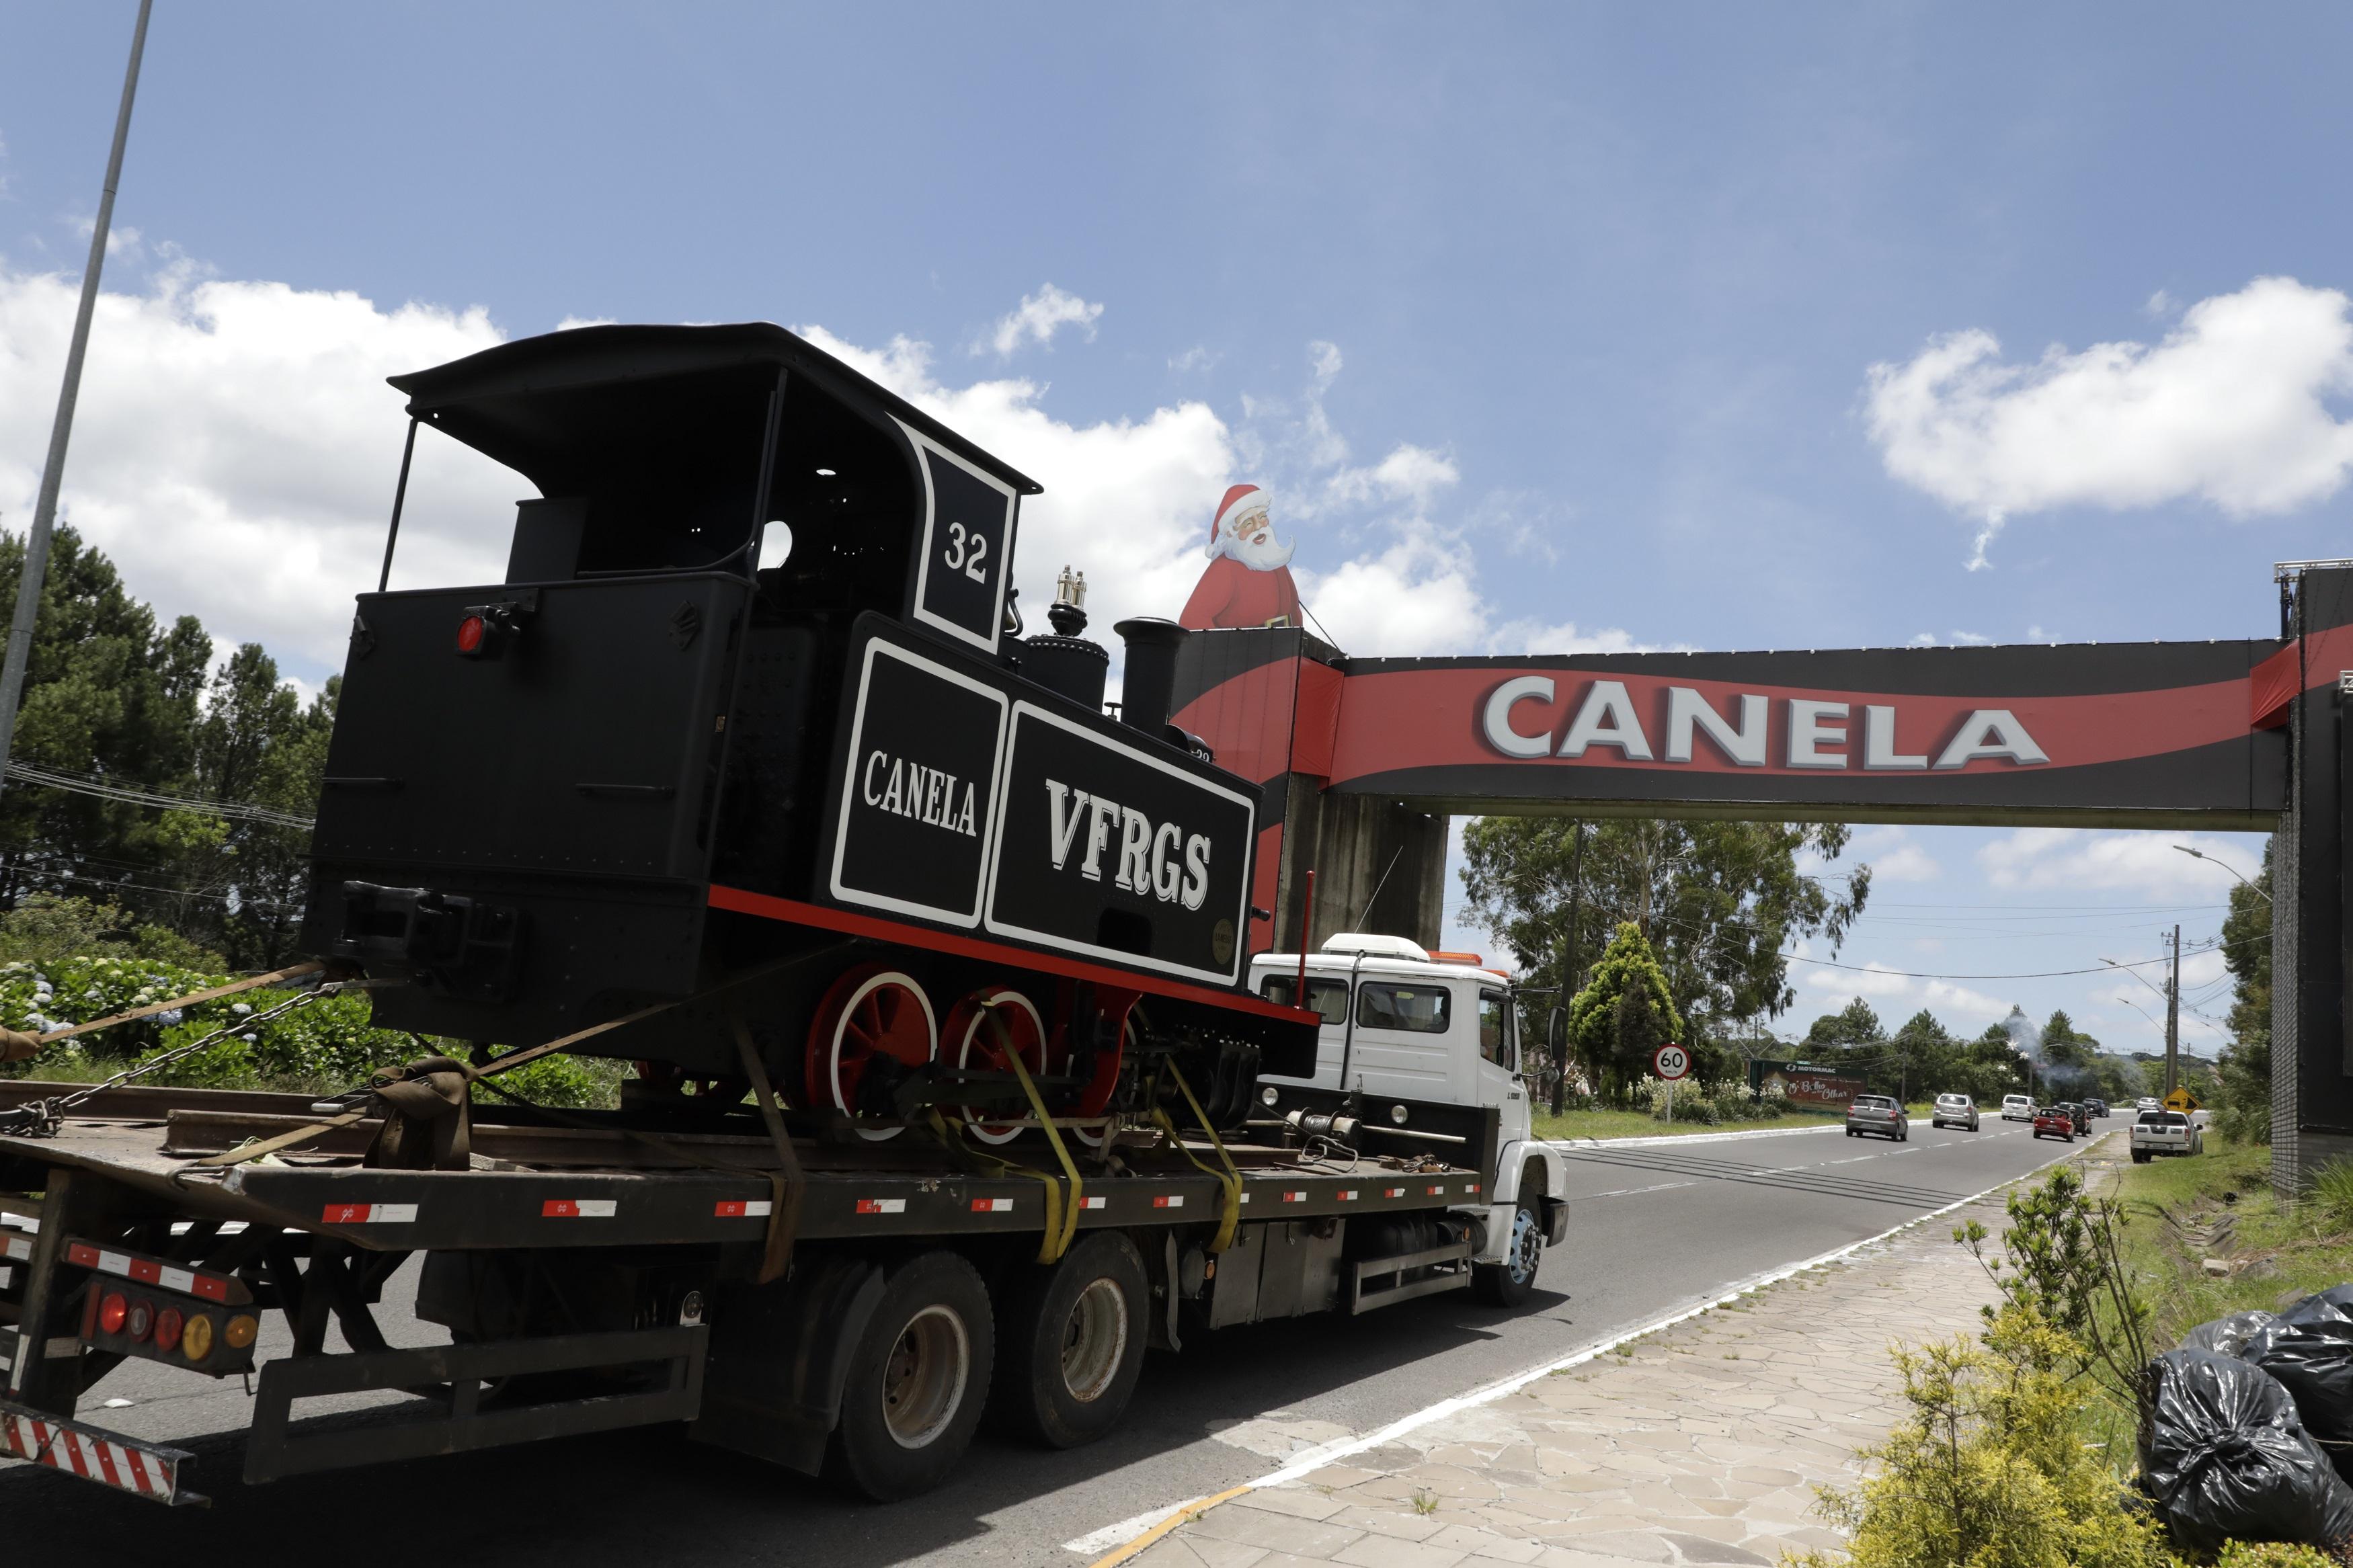 A locomotiva Le Muse retornando à Canela. - Foto: Cleiton Thiele